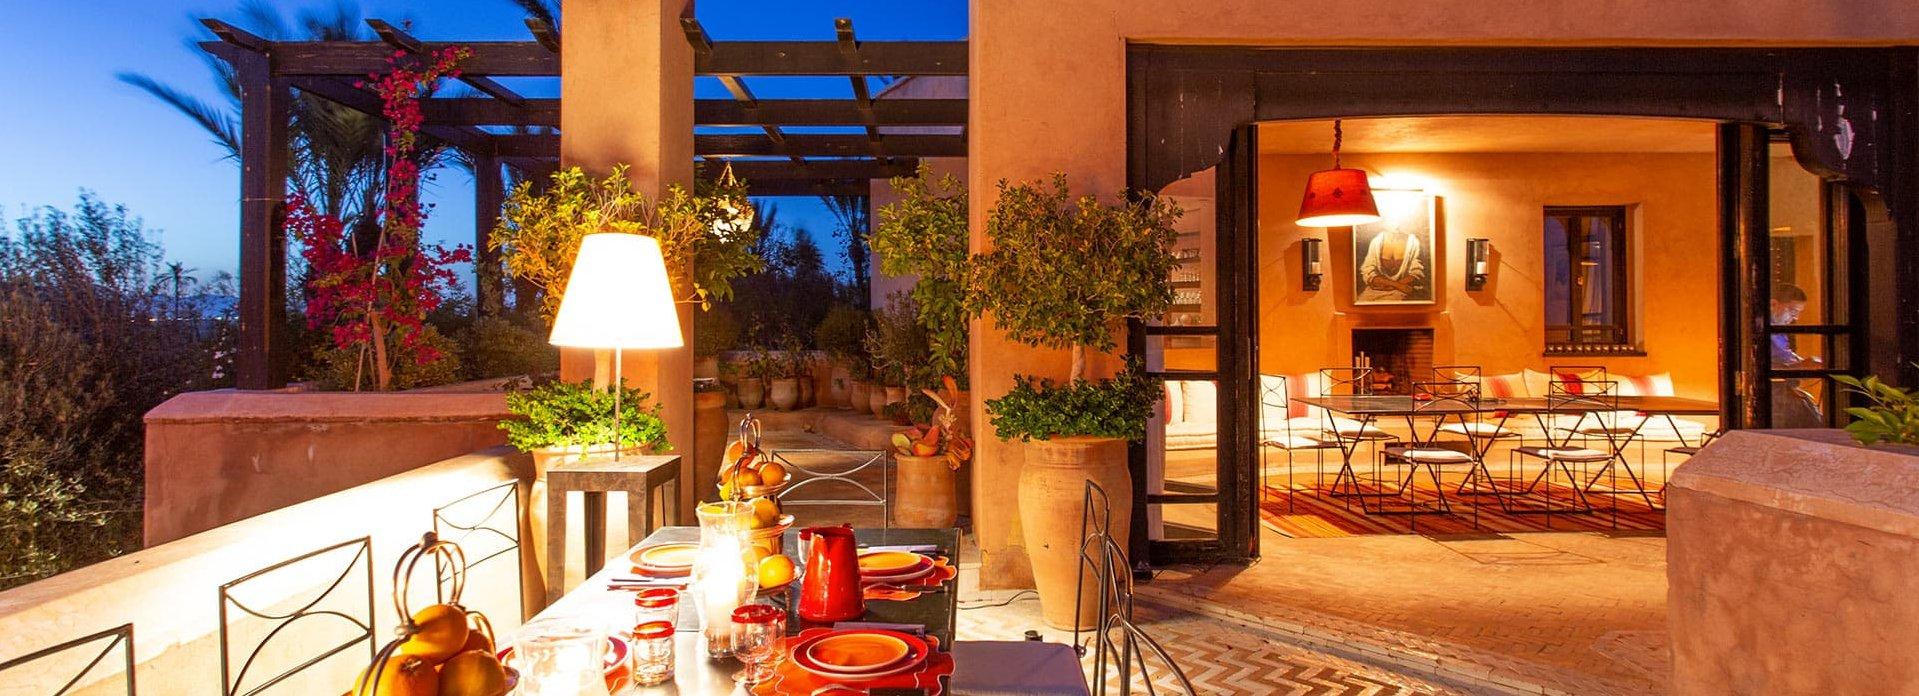 marrakech-villa-jacaranda-roof-terrace